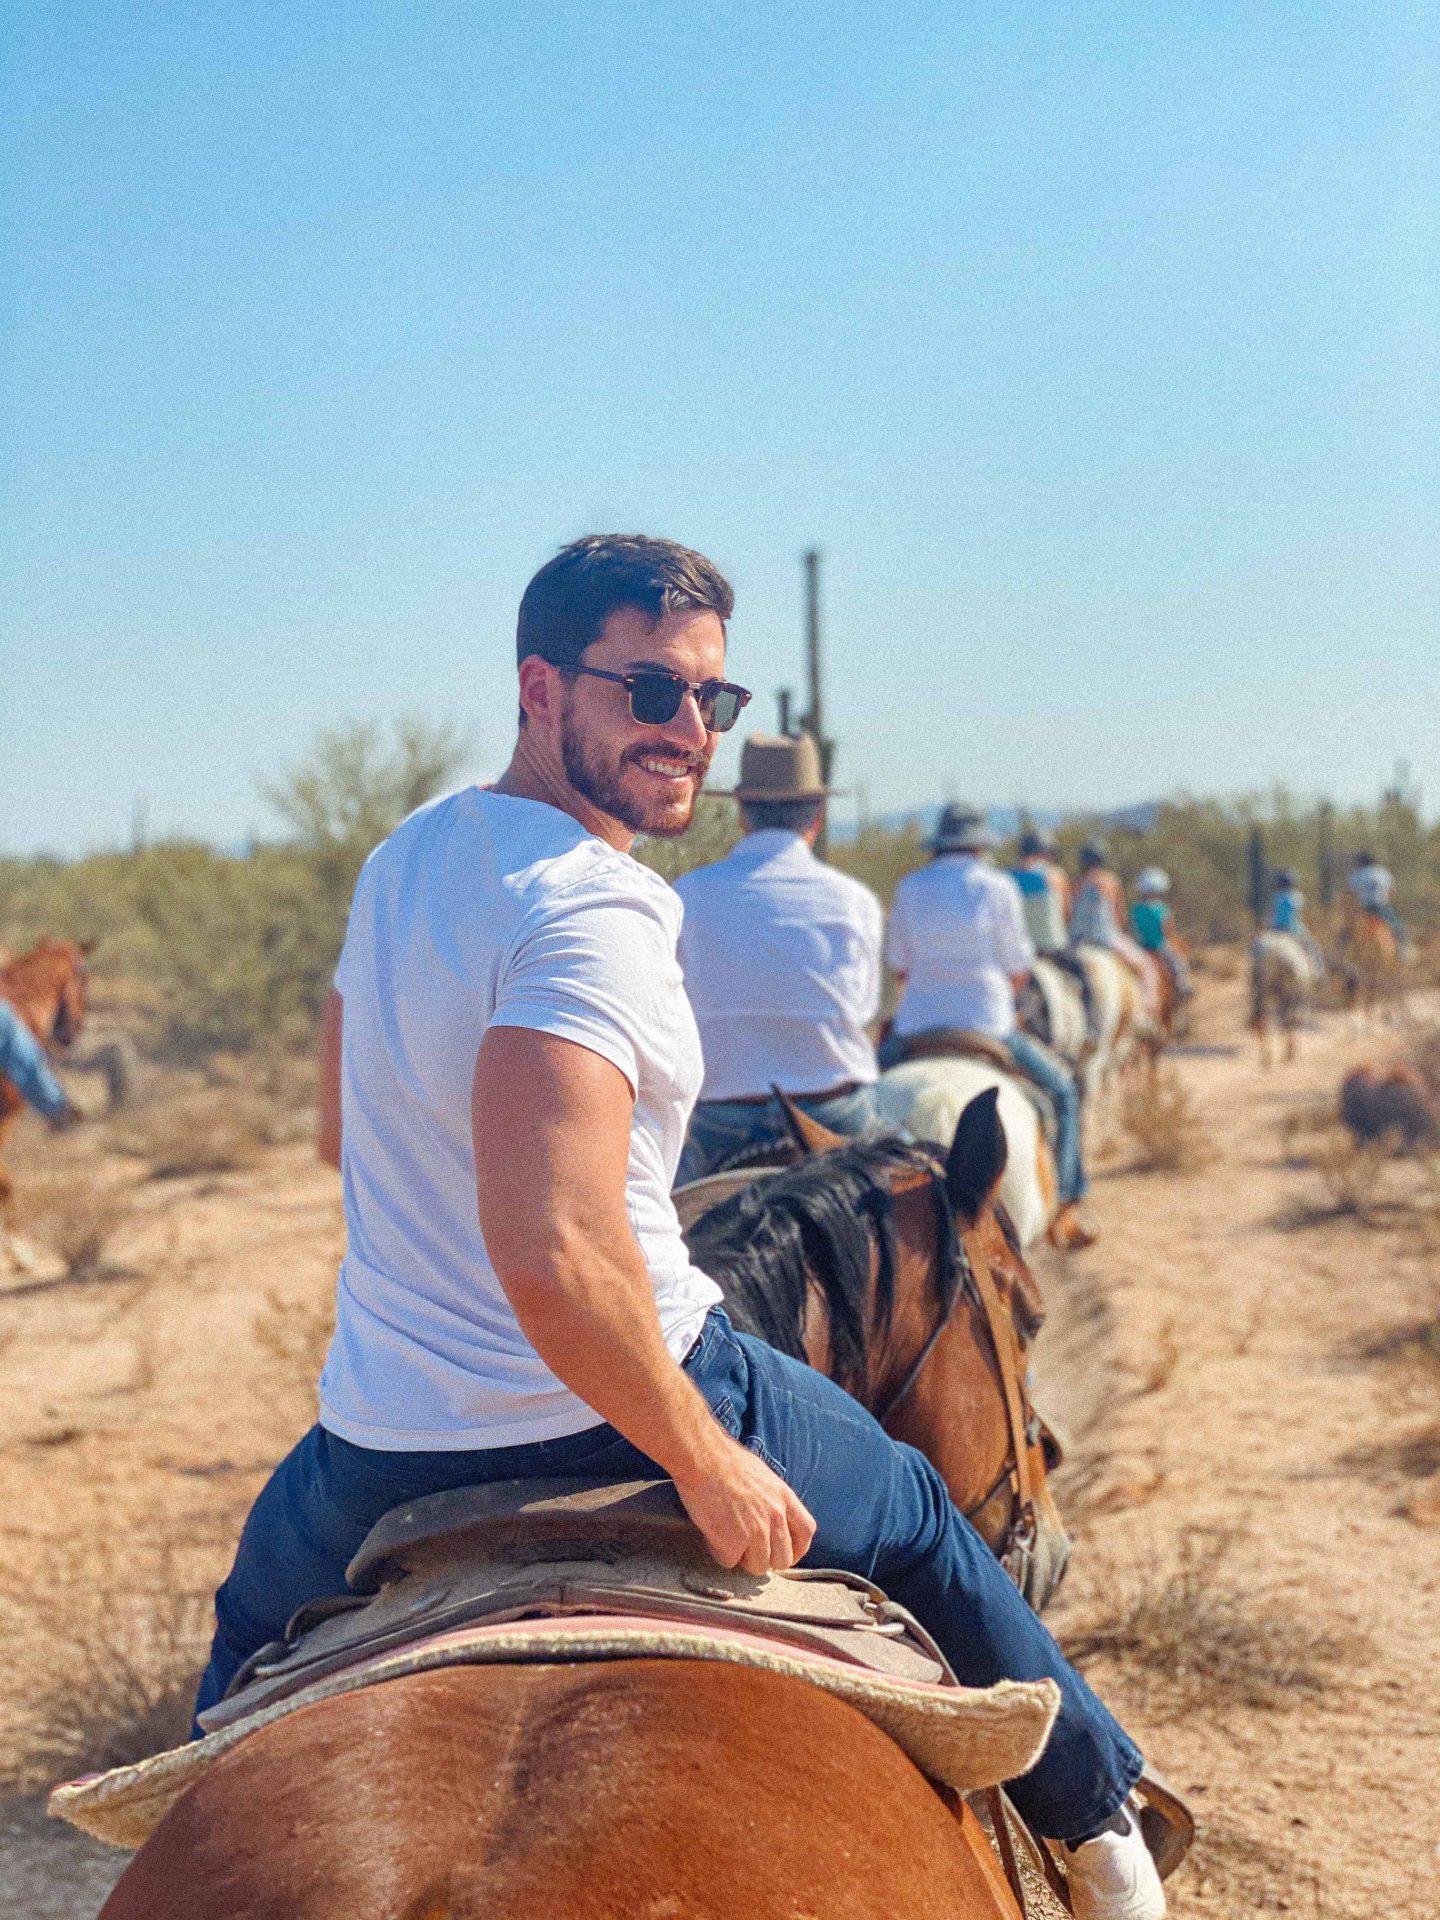 Travel guide scottsdale Arizona, what to do in scottsdale, horseback riding scottsdale, Macdonald ranch, desert, travel guide, traveling scottsdale, ultimate travel blog, scottsdale, sunrise horseback riding, phoenix, travel blogger, best spots in scottsdale, planning a trip to scottsdale, honeymoon